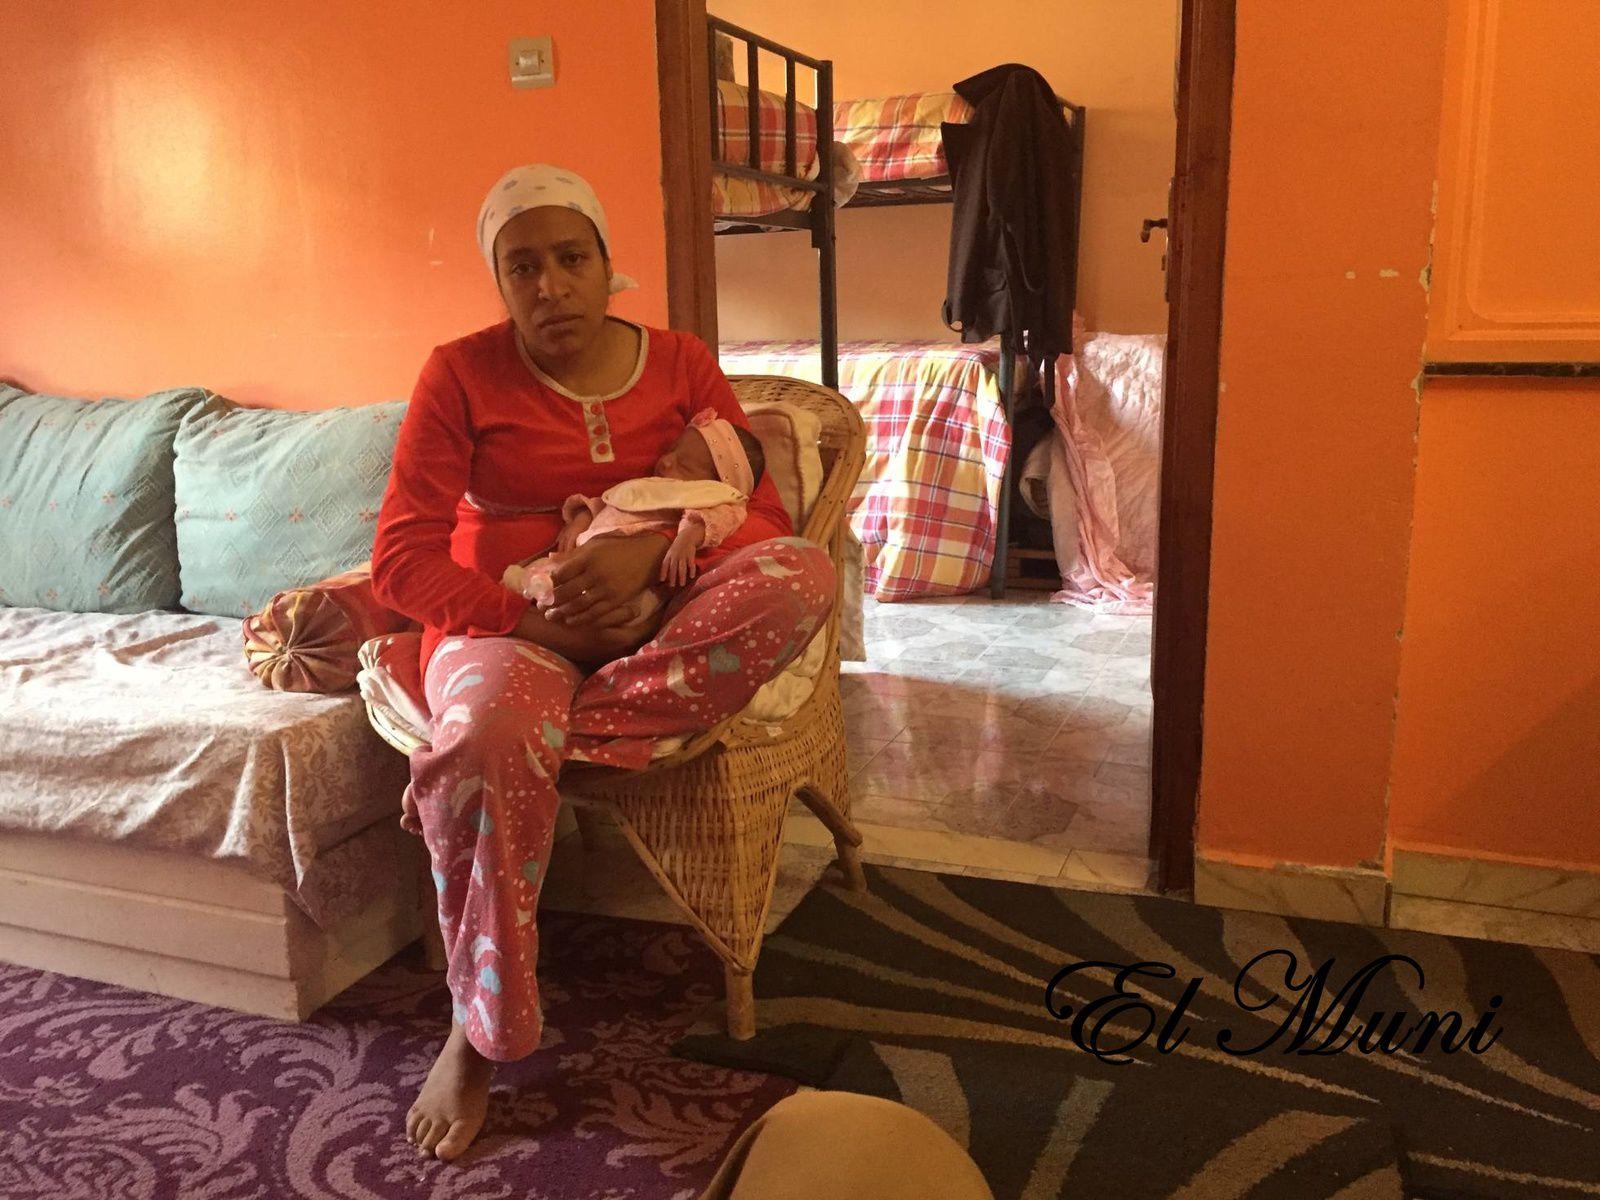 Chicas Solteras En Marruecos 2018 Masajista Tantrica San Laguna-84123